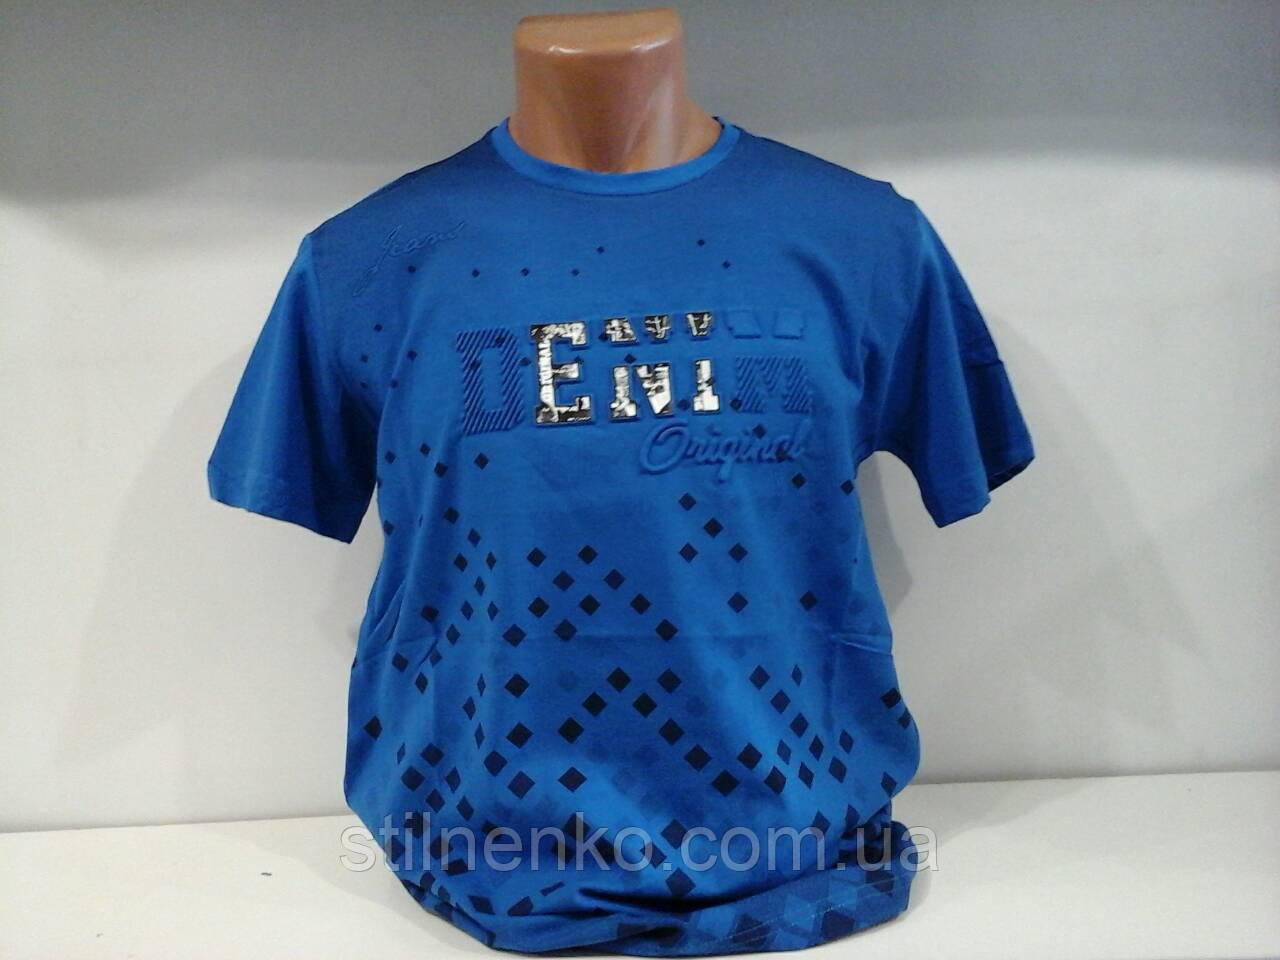 Футболка мужская CRACOW р-р M. L. XL. 2xl